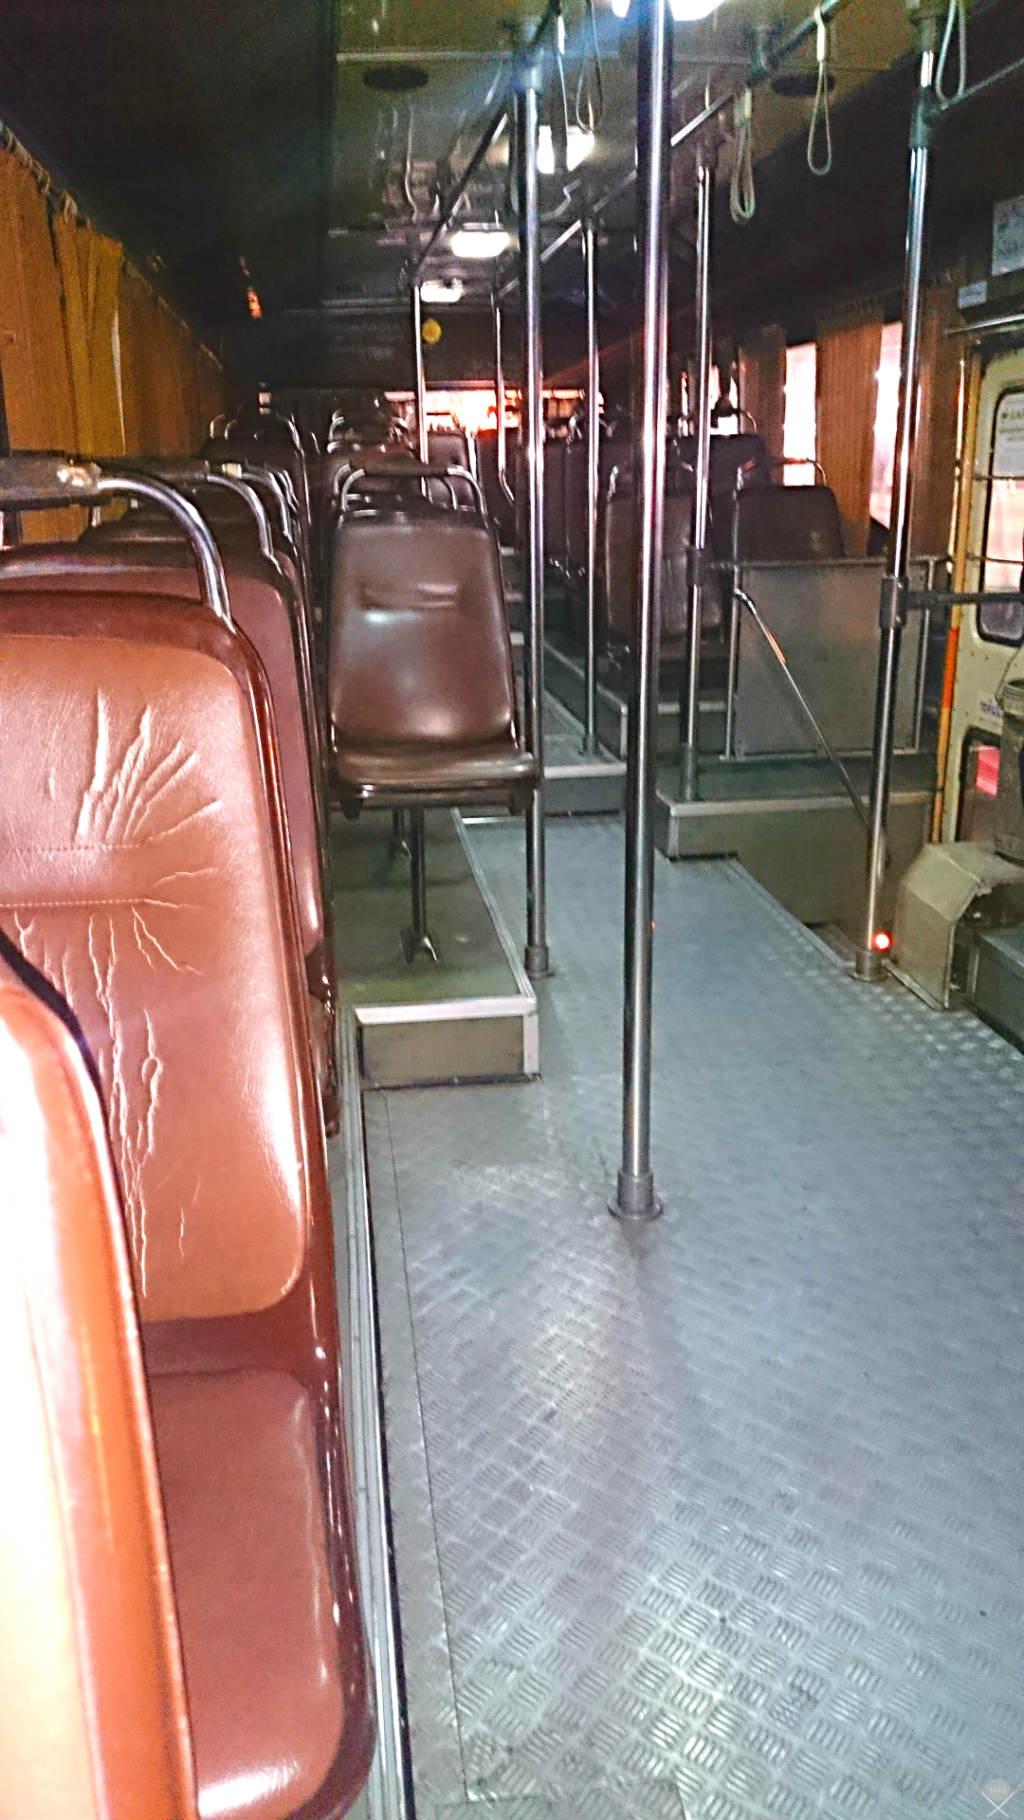 Thailand Kanchanaburi Bus 1 Vida de Tsuge VDT 1024x1820